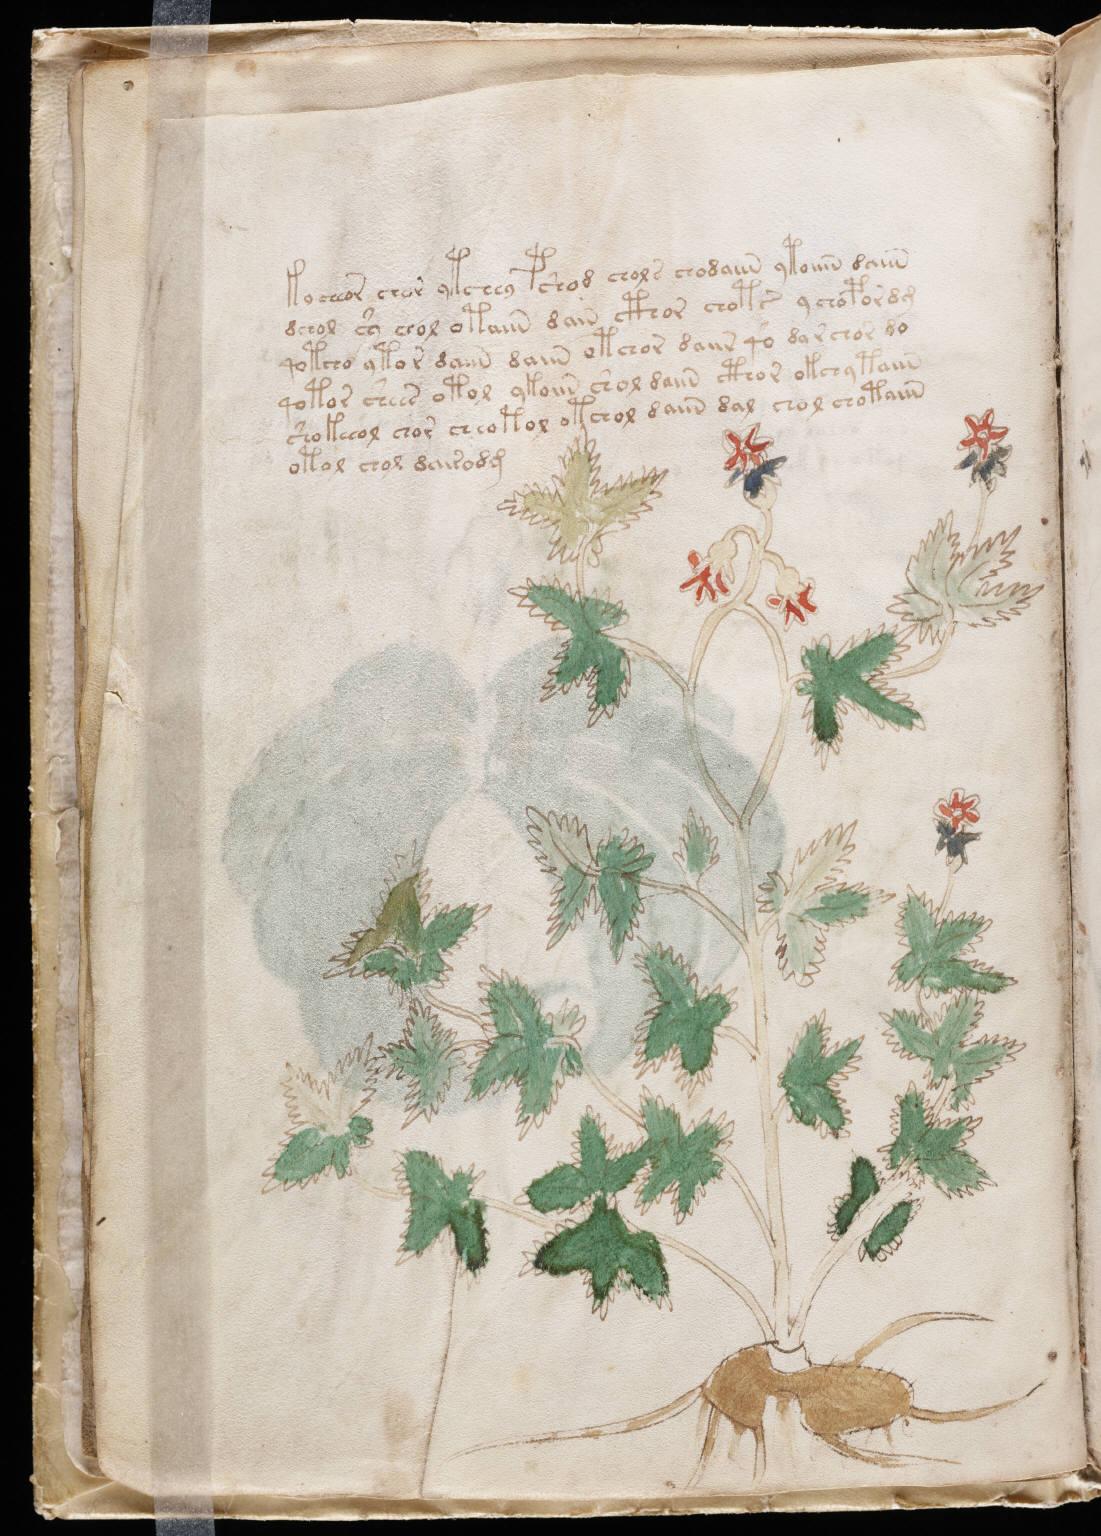 https://upload.wikimedia.org/wikipedia/commons/a/a6/Voynich_Manuscript_%2812%29.jpg